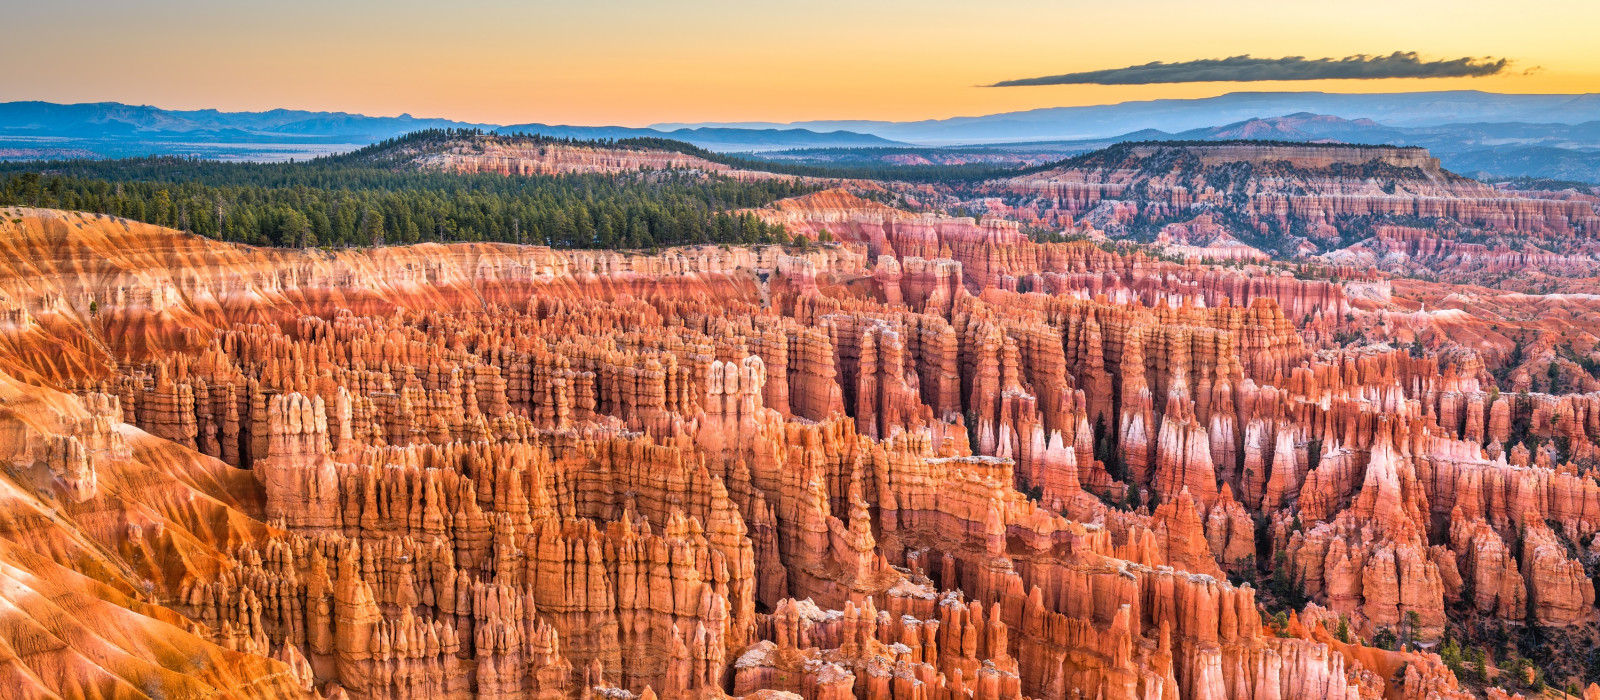 Reiseziel Bryce Canyon Nationalpark USA